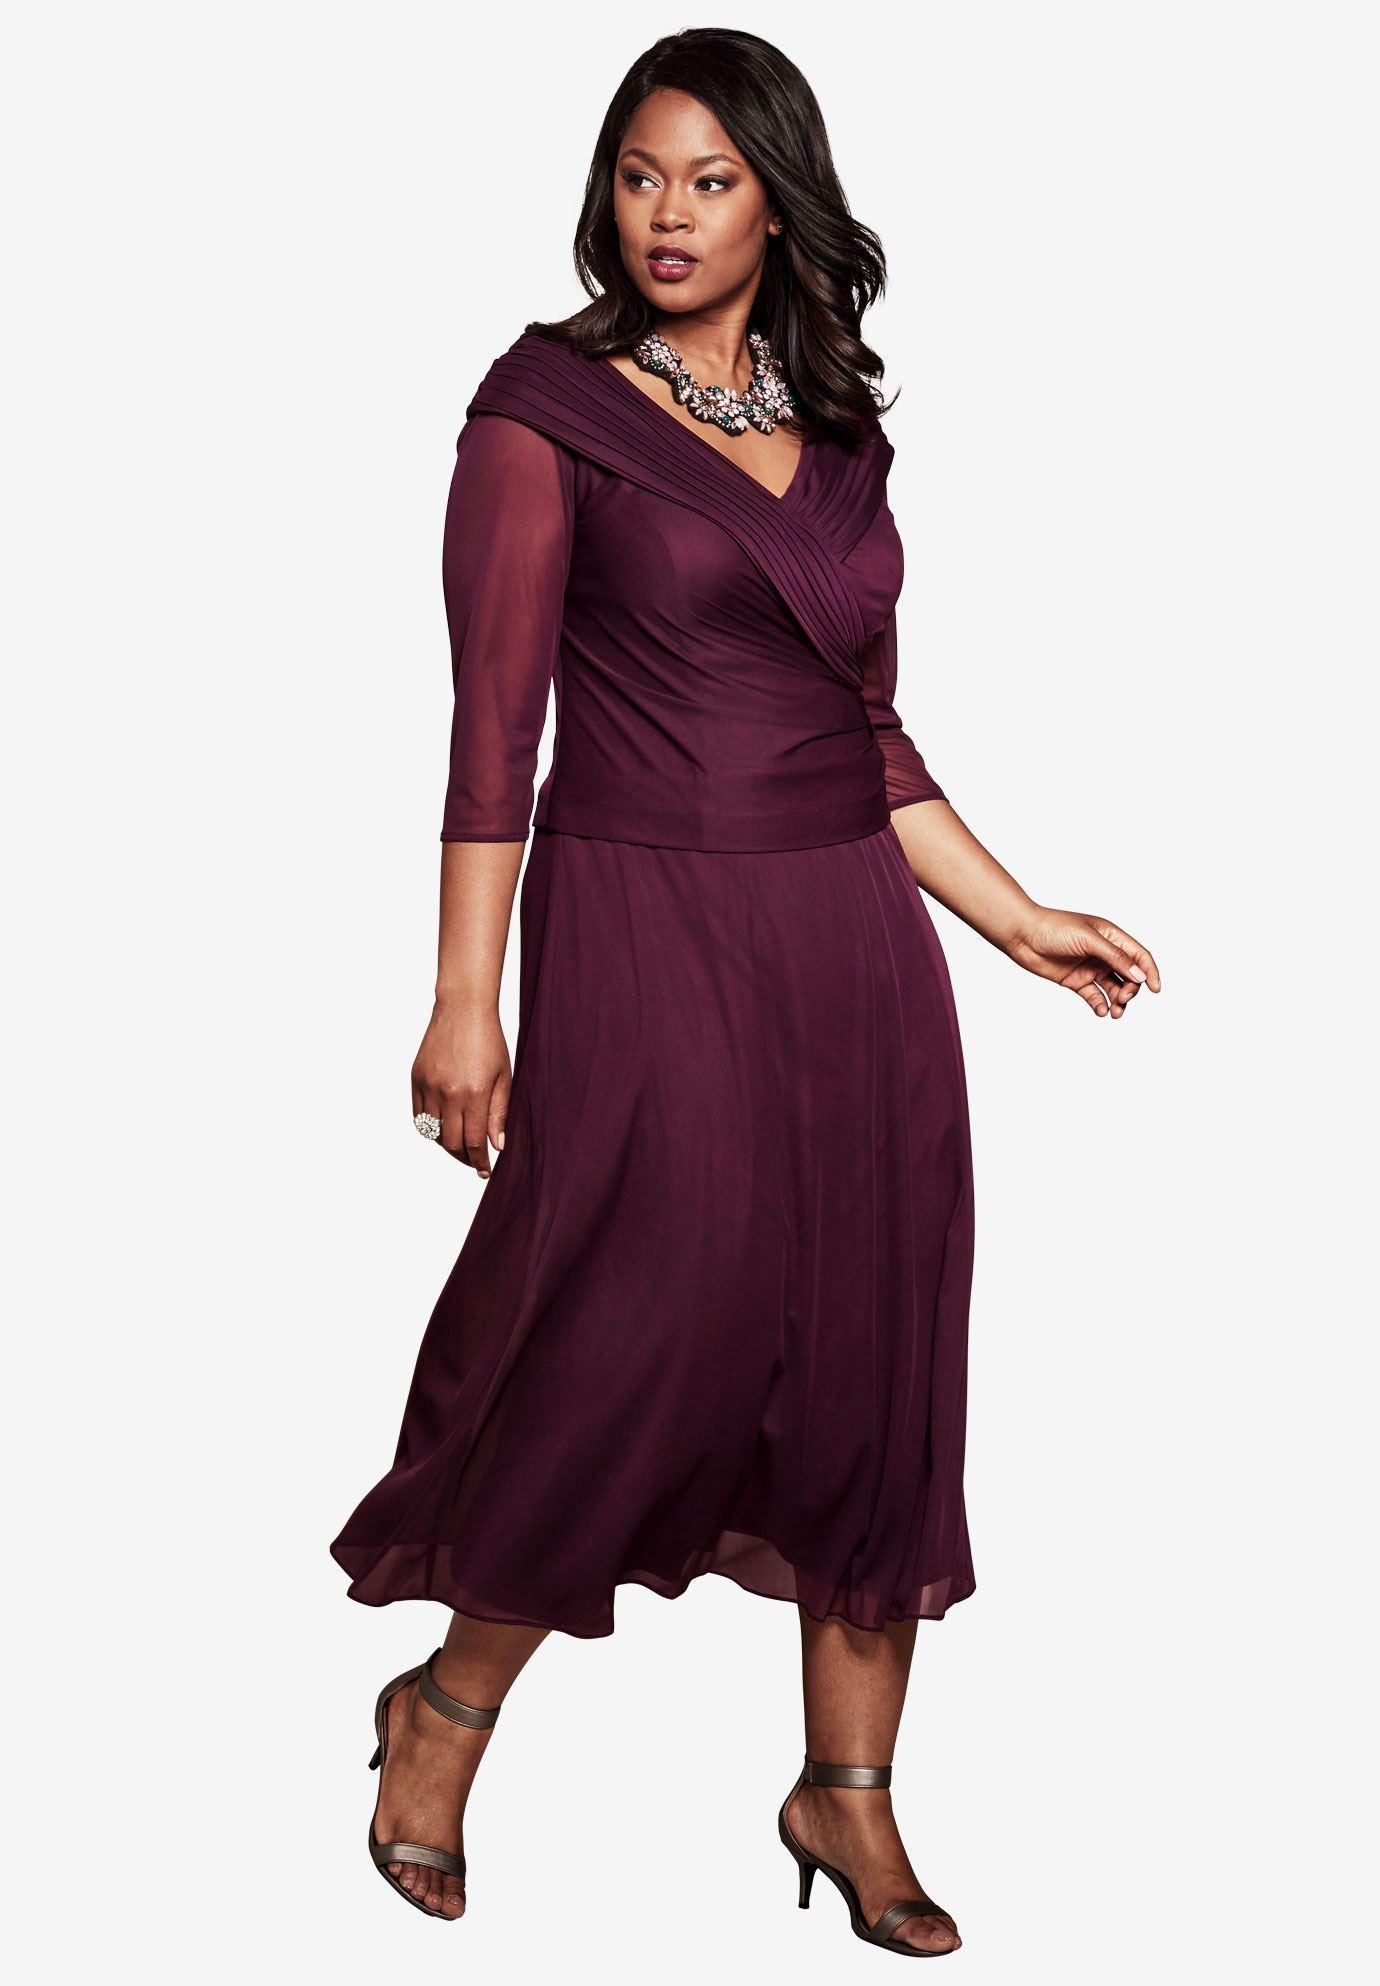 Shawl Collar Dress   Plus Size Evening Dresses   Roaman\'s